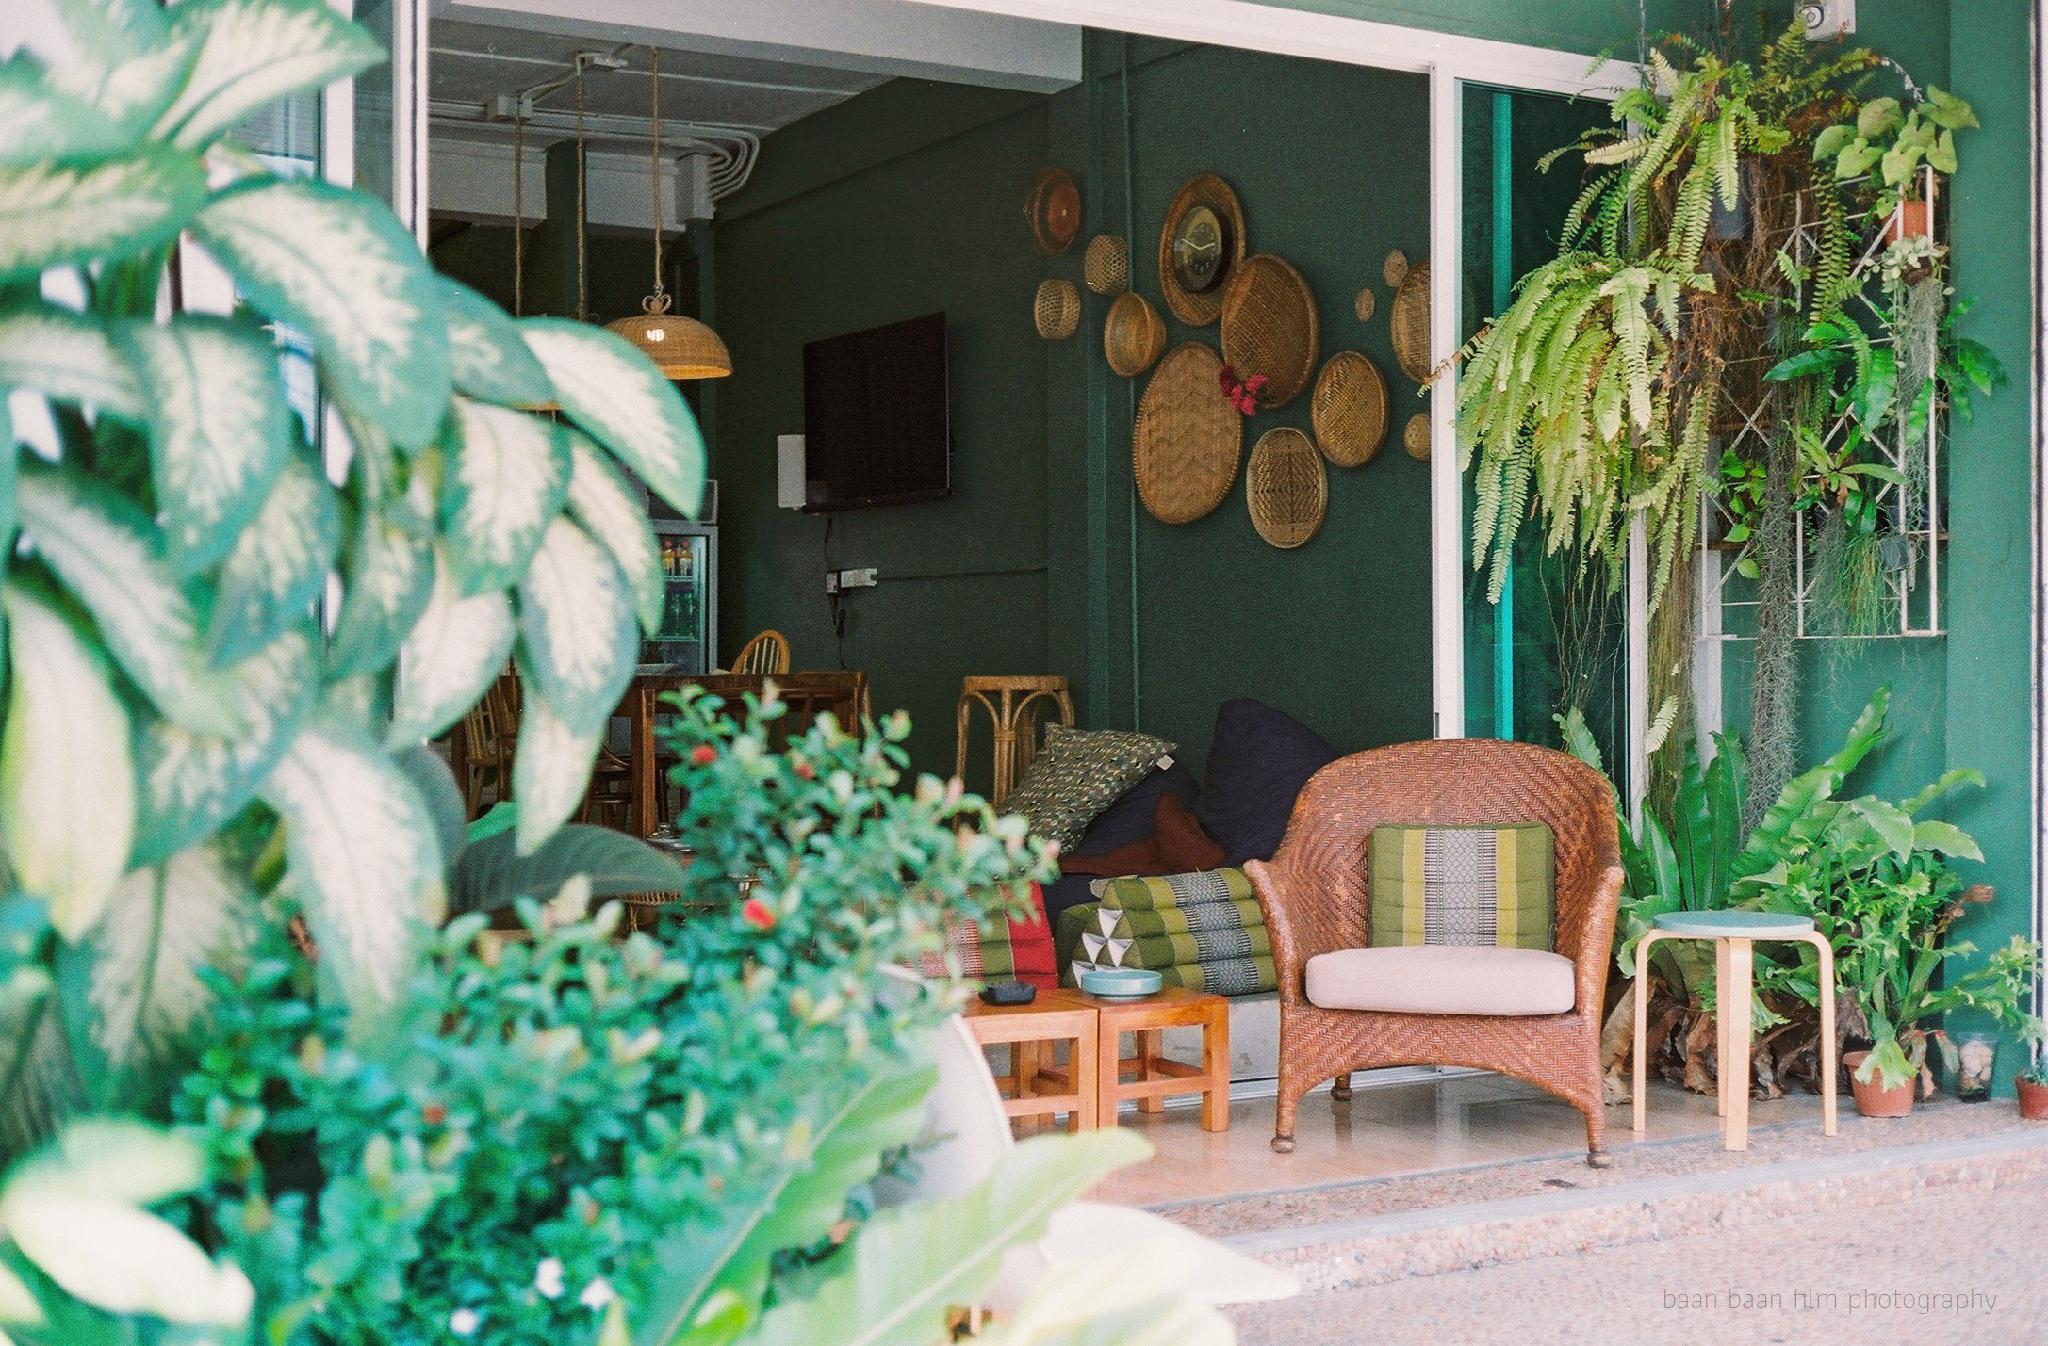 Baan Baan Hostel - Top 5 best hostels in Phuket